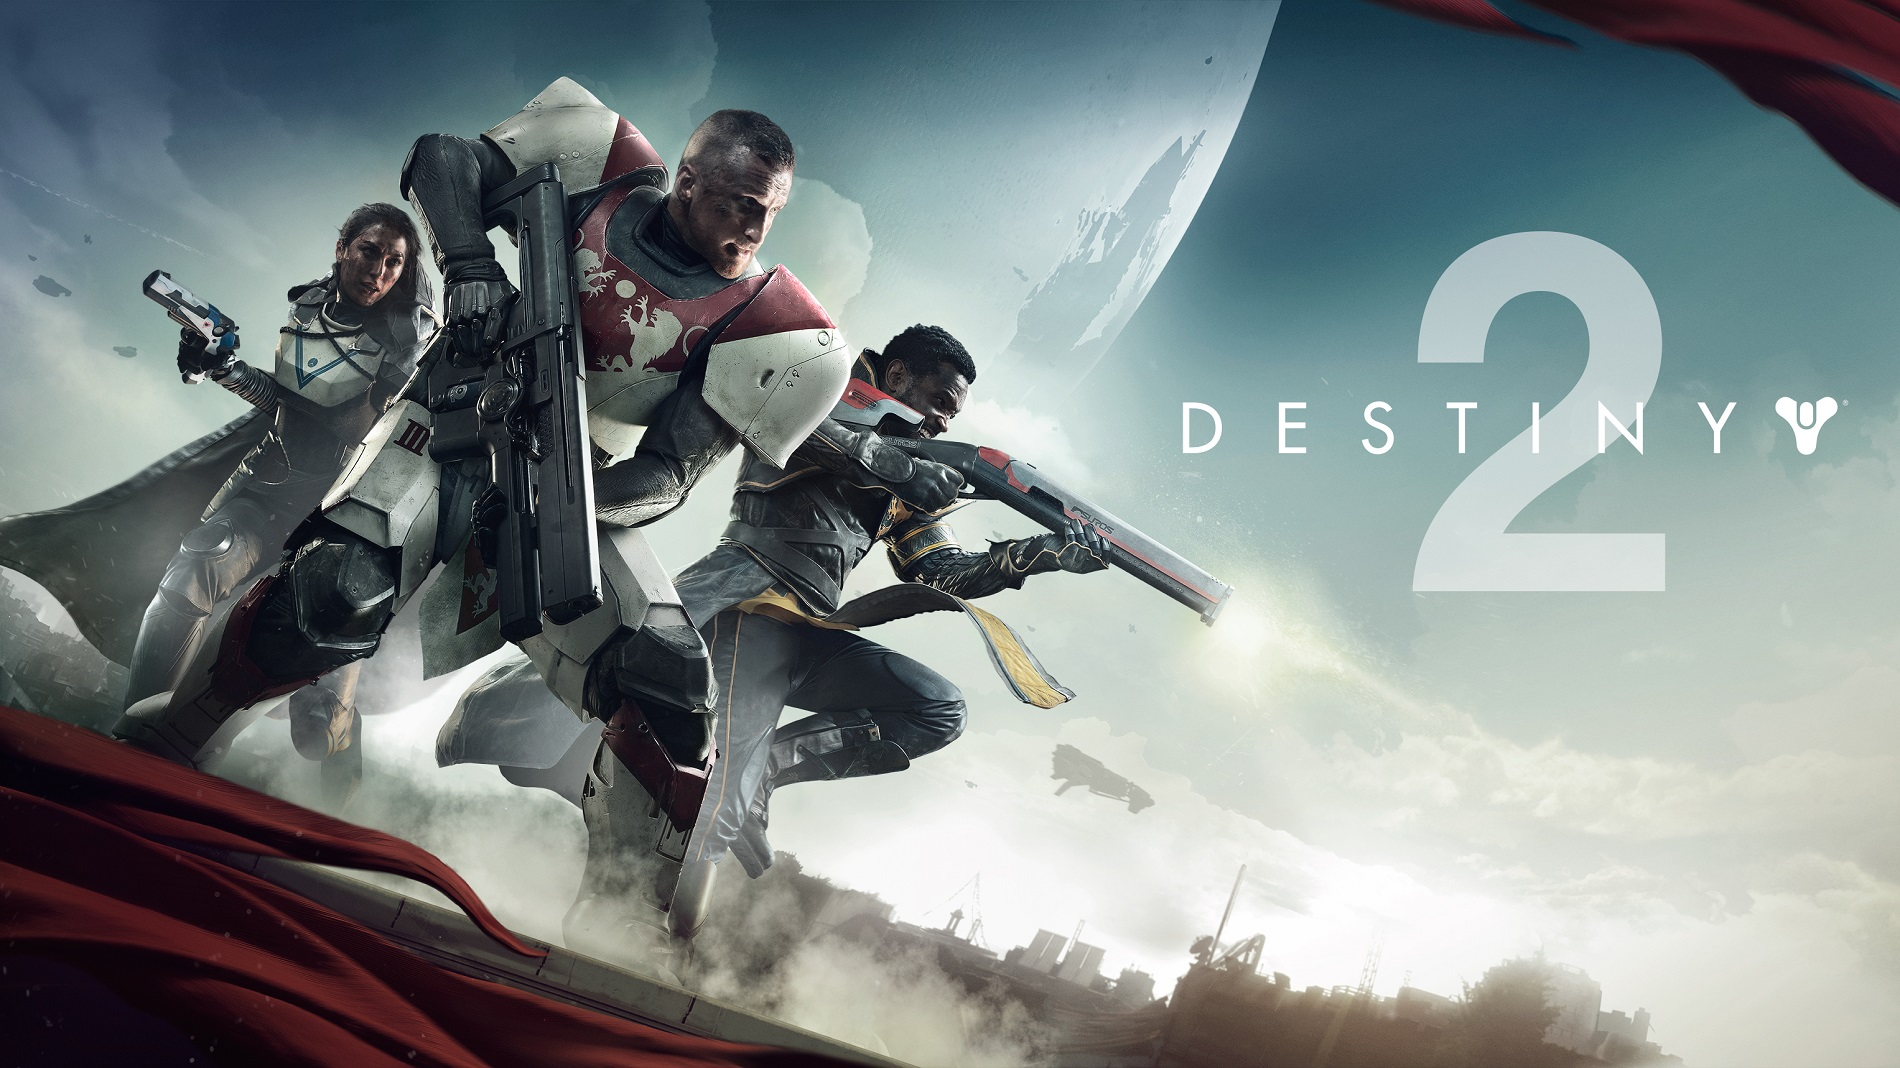 destiny 2 26102017 05